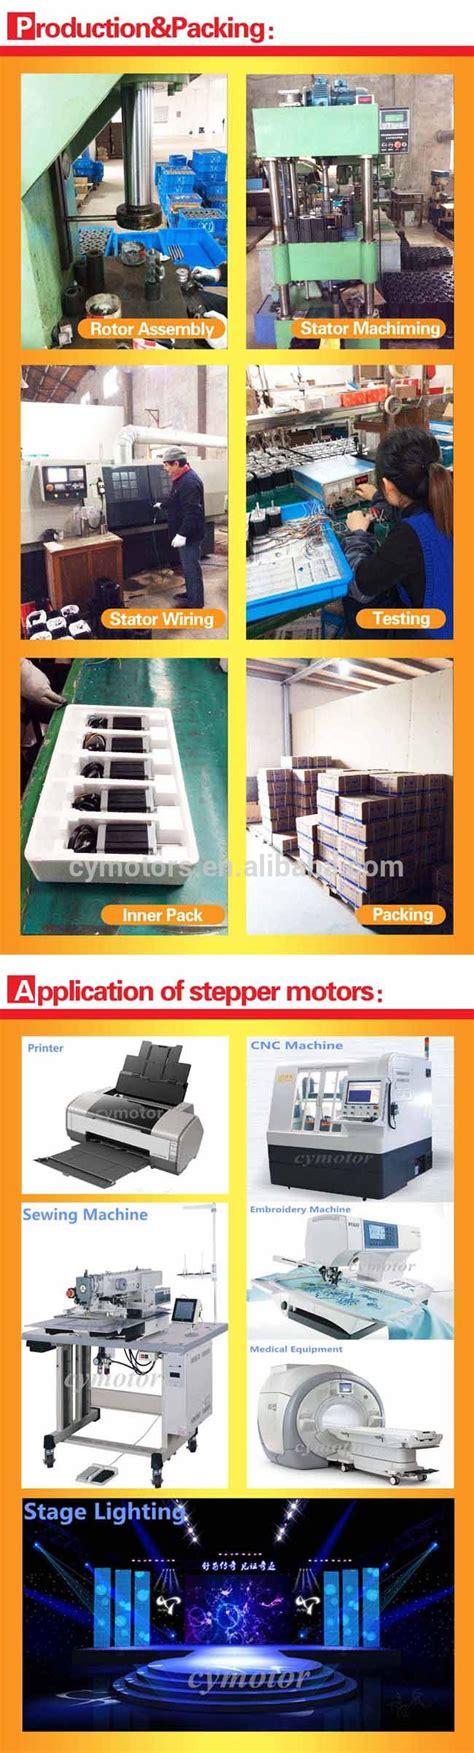 57 Stepper Motor Nema 23 3a Torque 12nm Tb6600 Drive Limited nema 23 geared stepper motor 57mm gearhead planetary